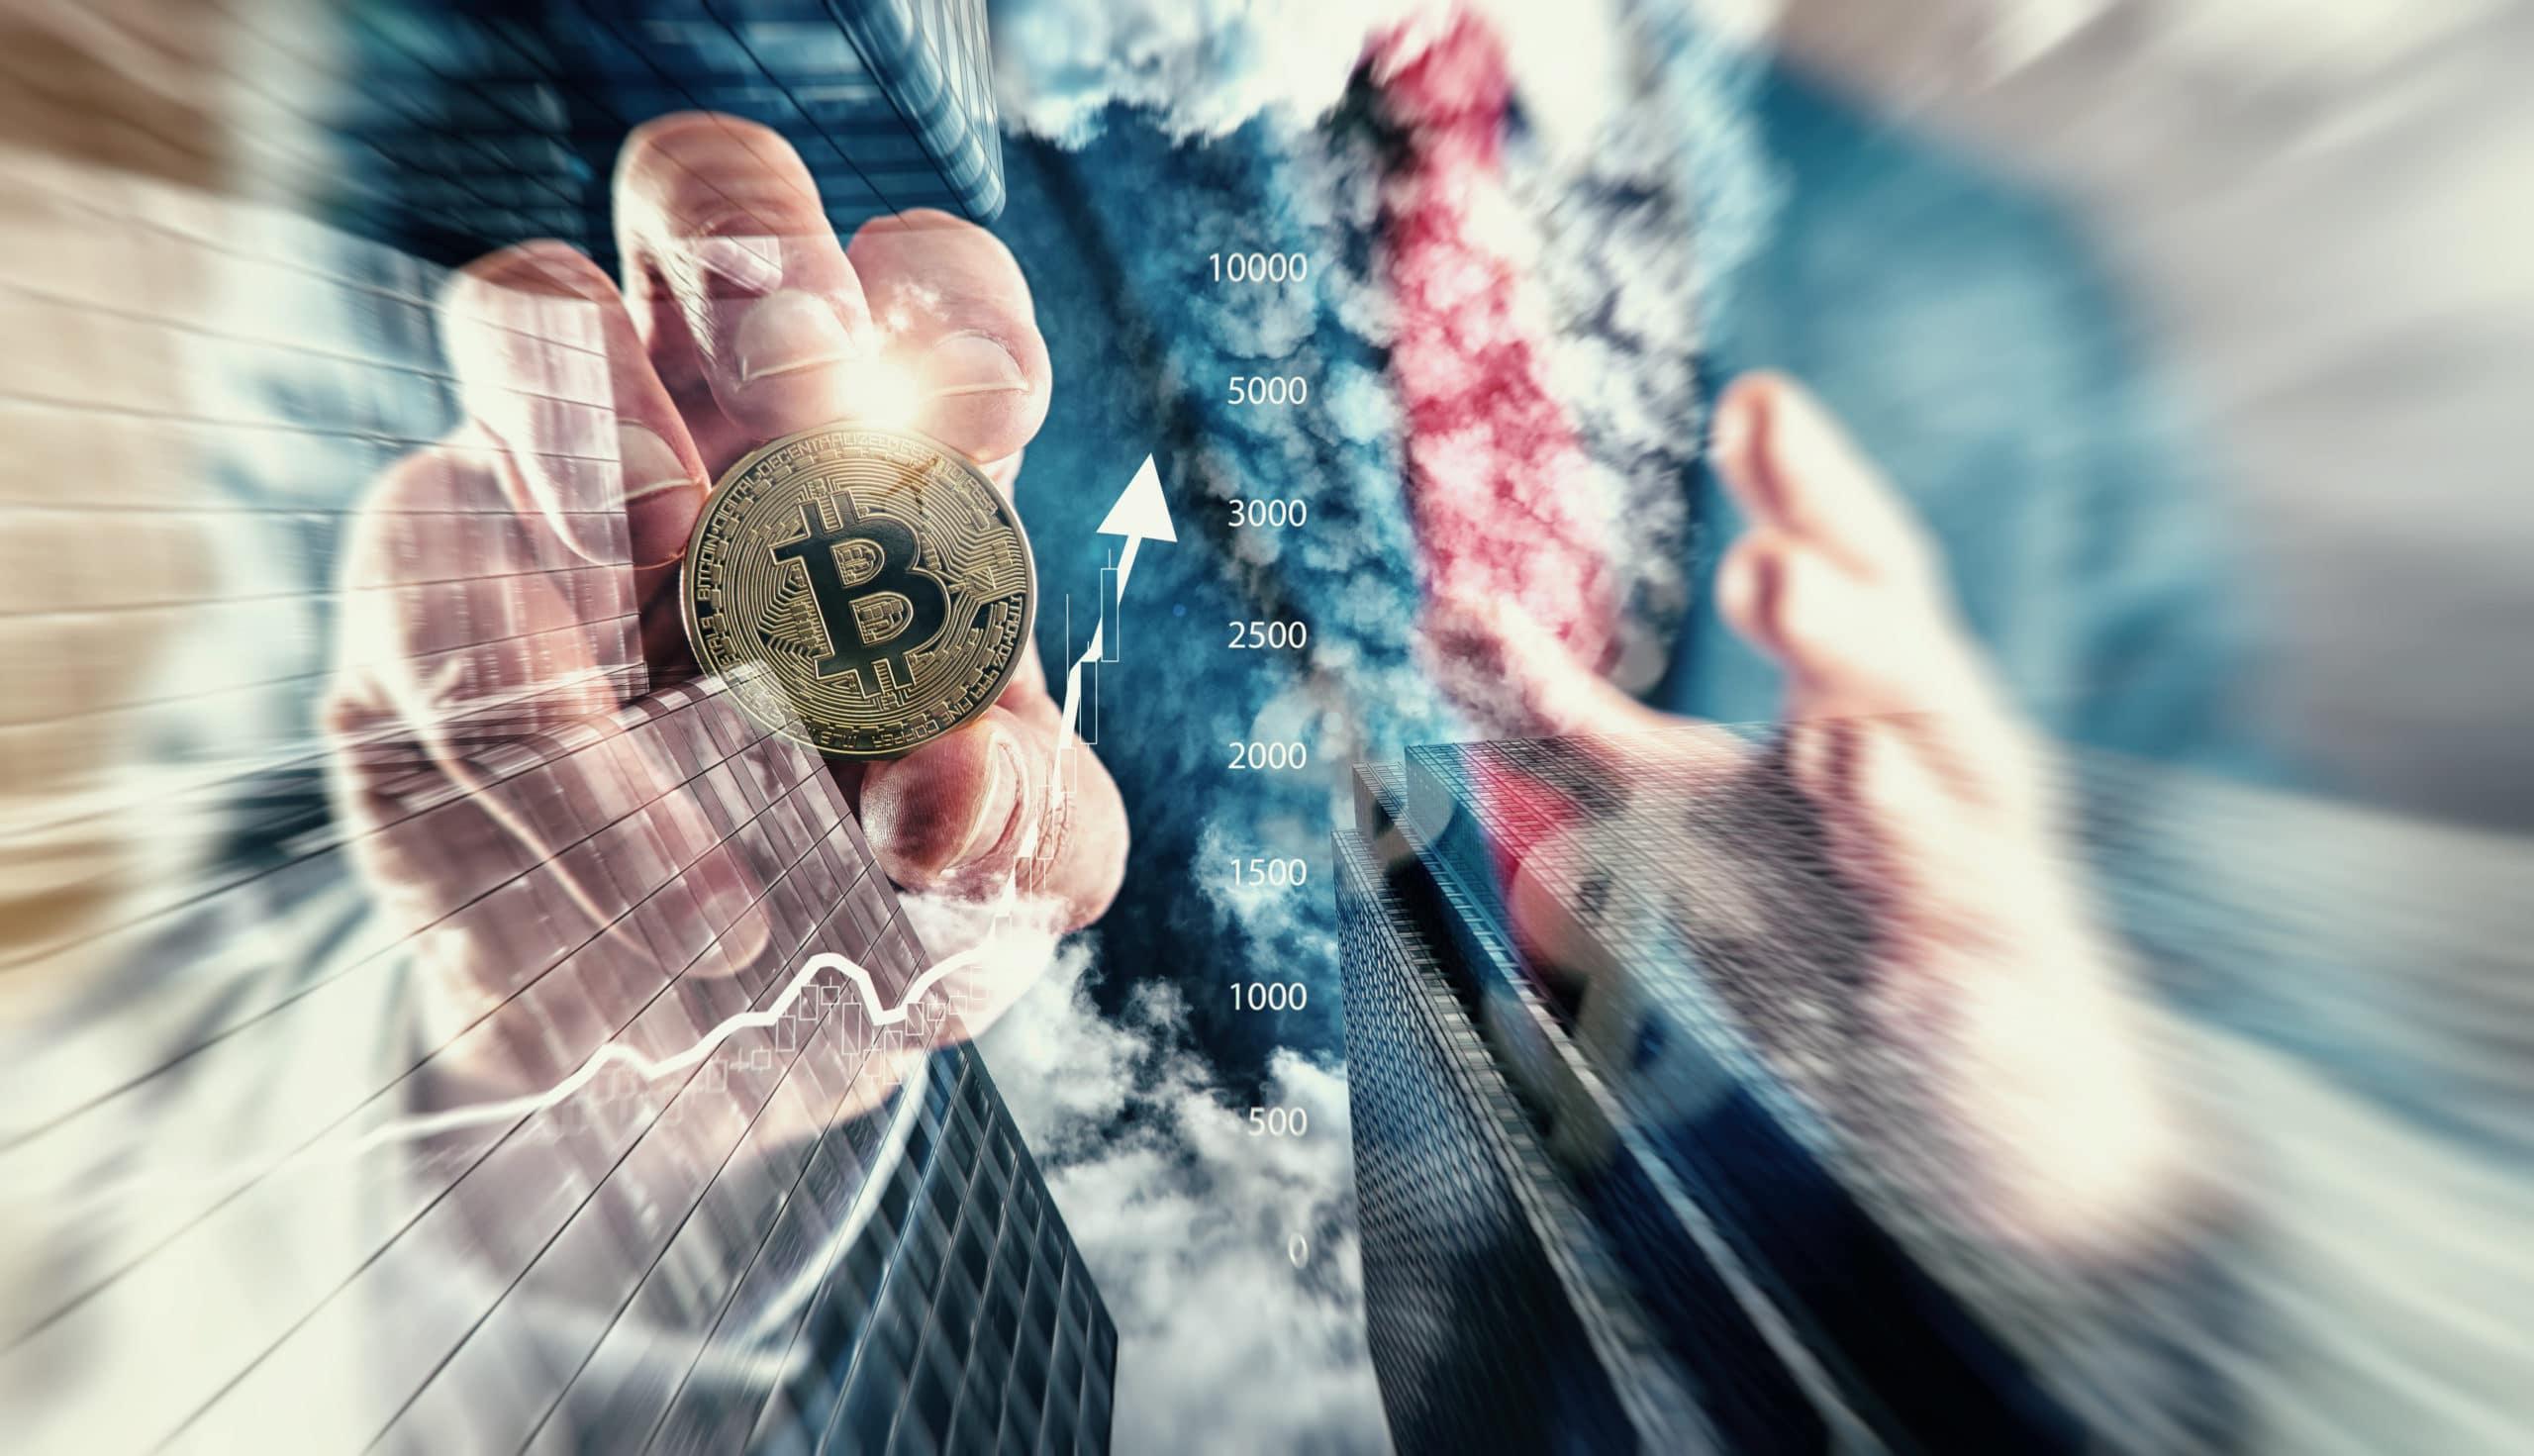 Big Corporates and Firms Buy Into Bitcoin (BTC) Dips